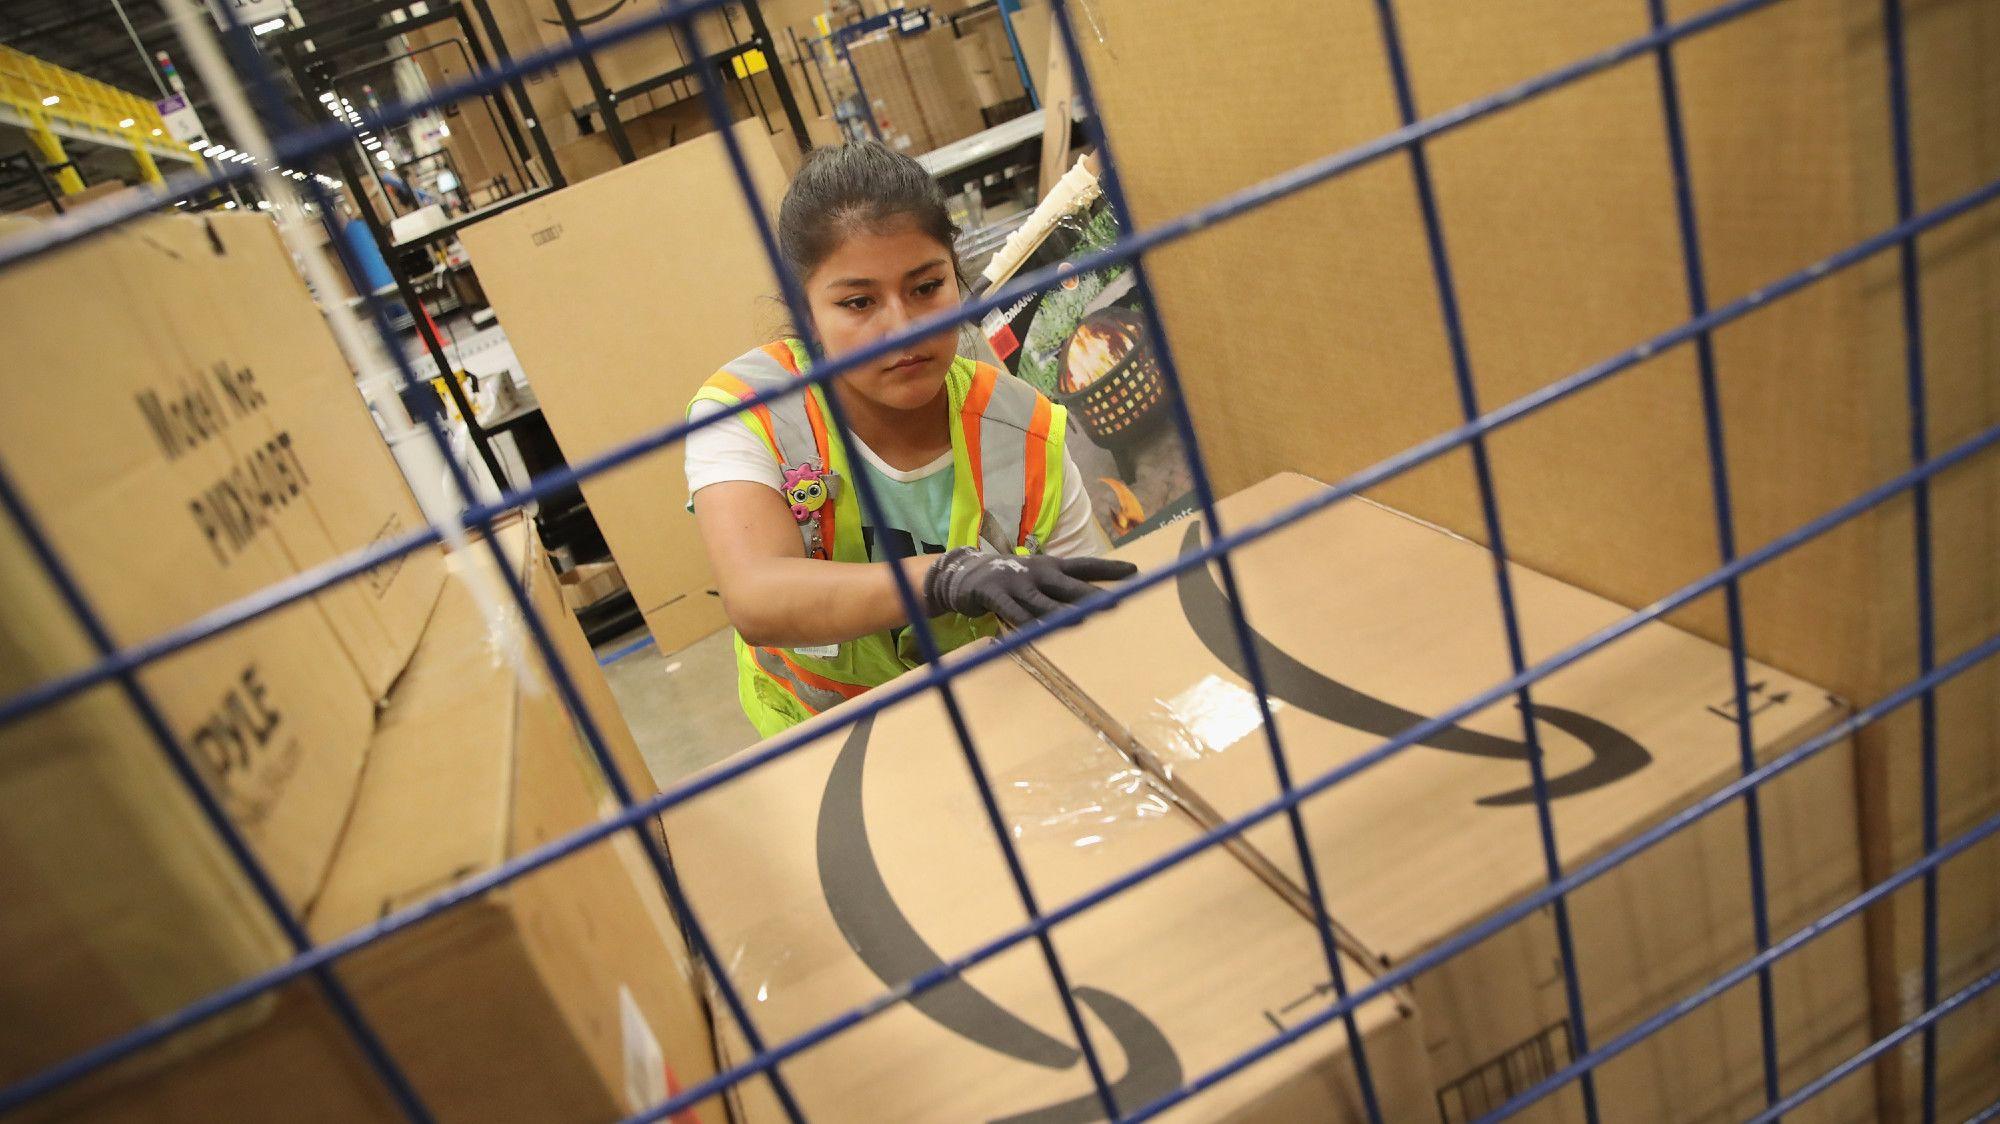 16 Secrets of Amazon Warehouse Employees